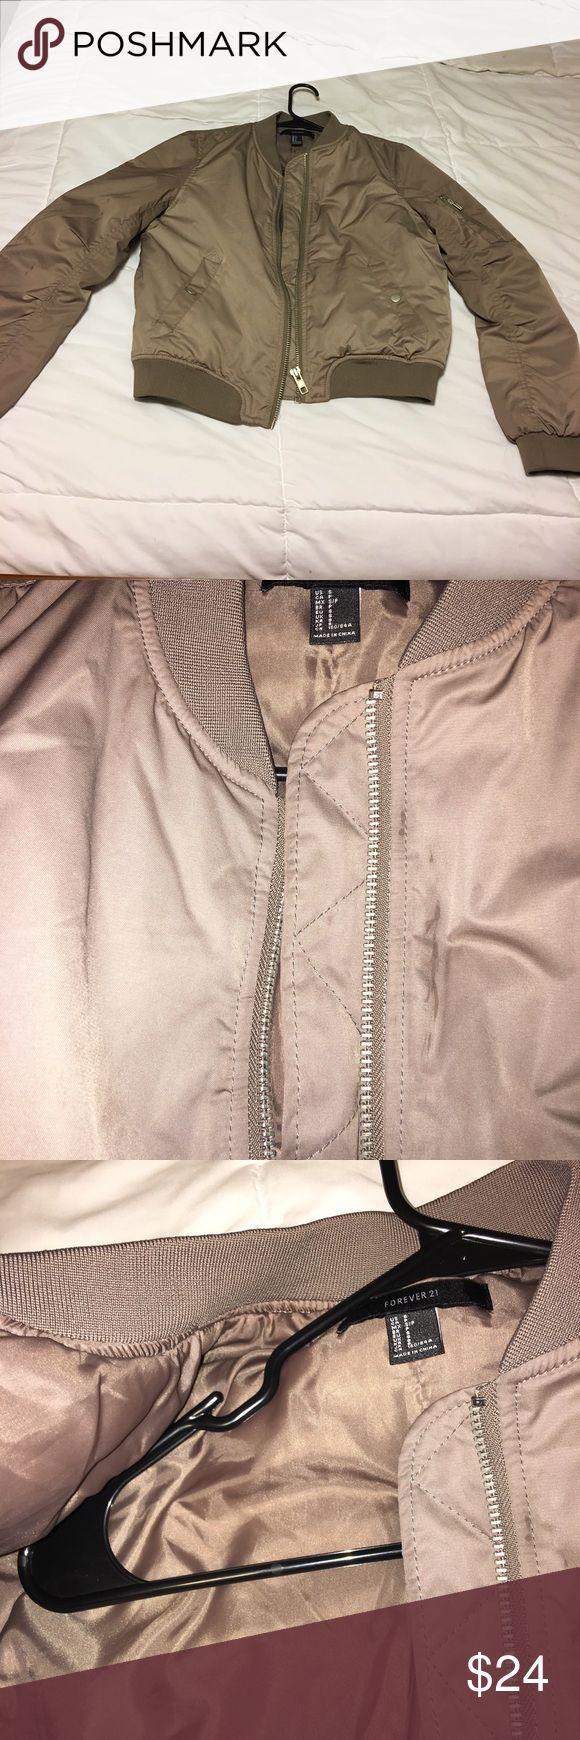 Forever 21 combat jacket Forever 21 combat jacket: worn size small no trades Forever 21 Jackets & Coats